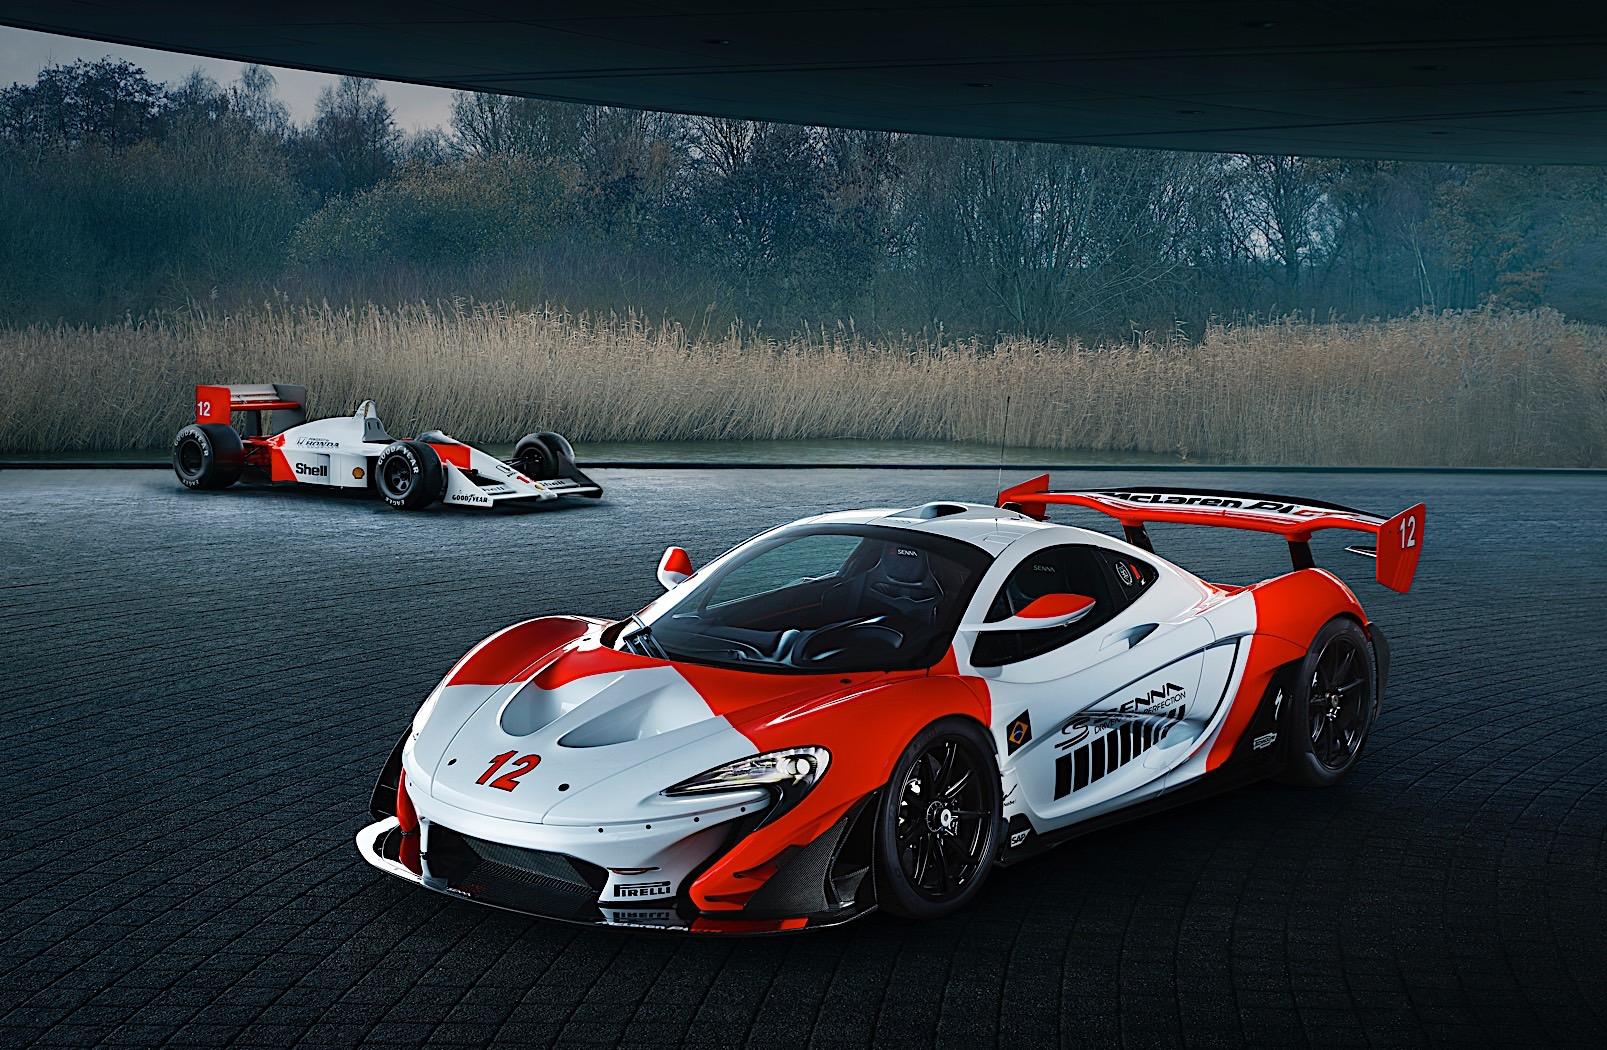 McLaren reveals bespoke P1 GTR inspired by Ayrton Senna